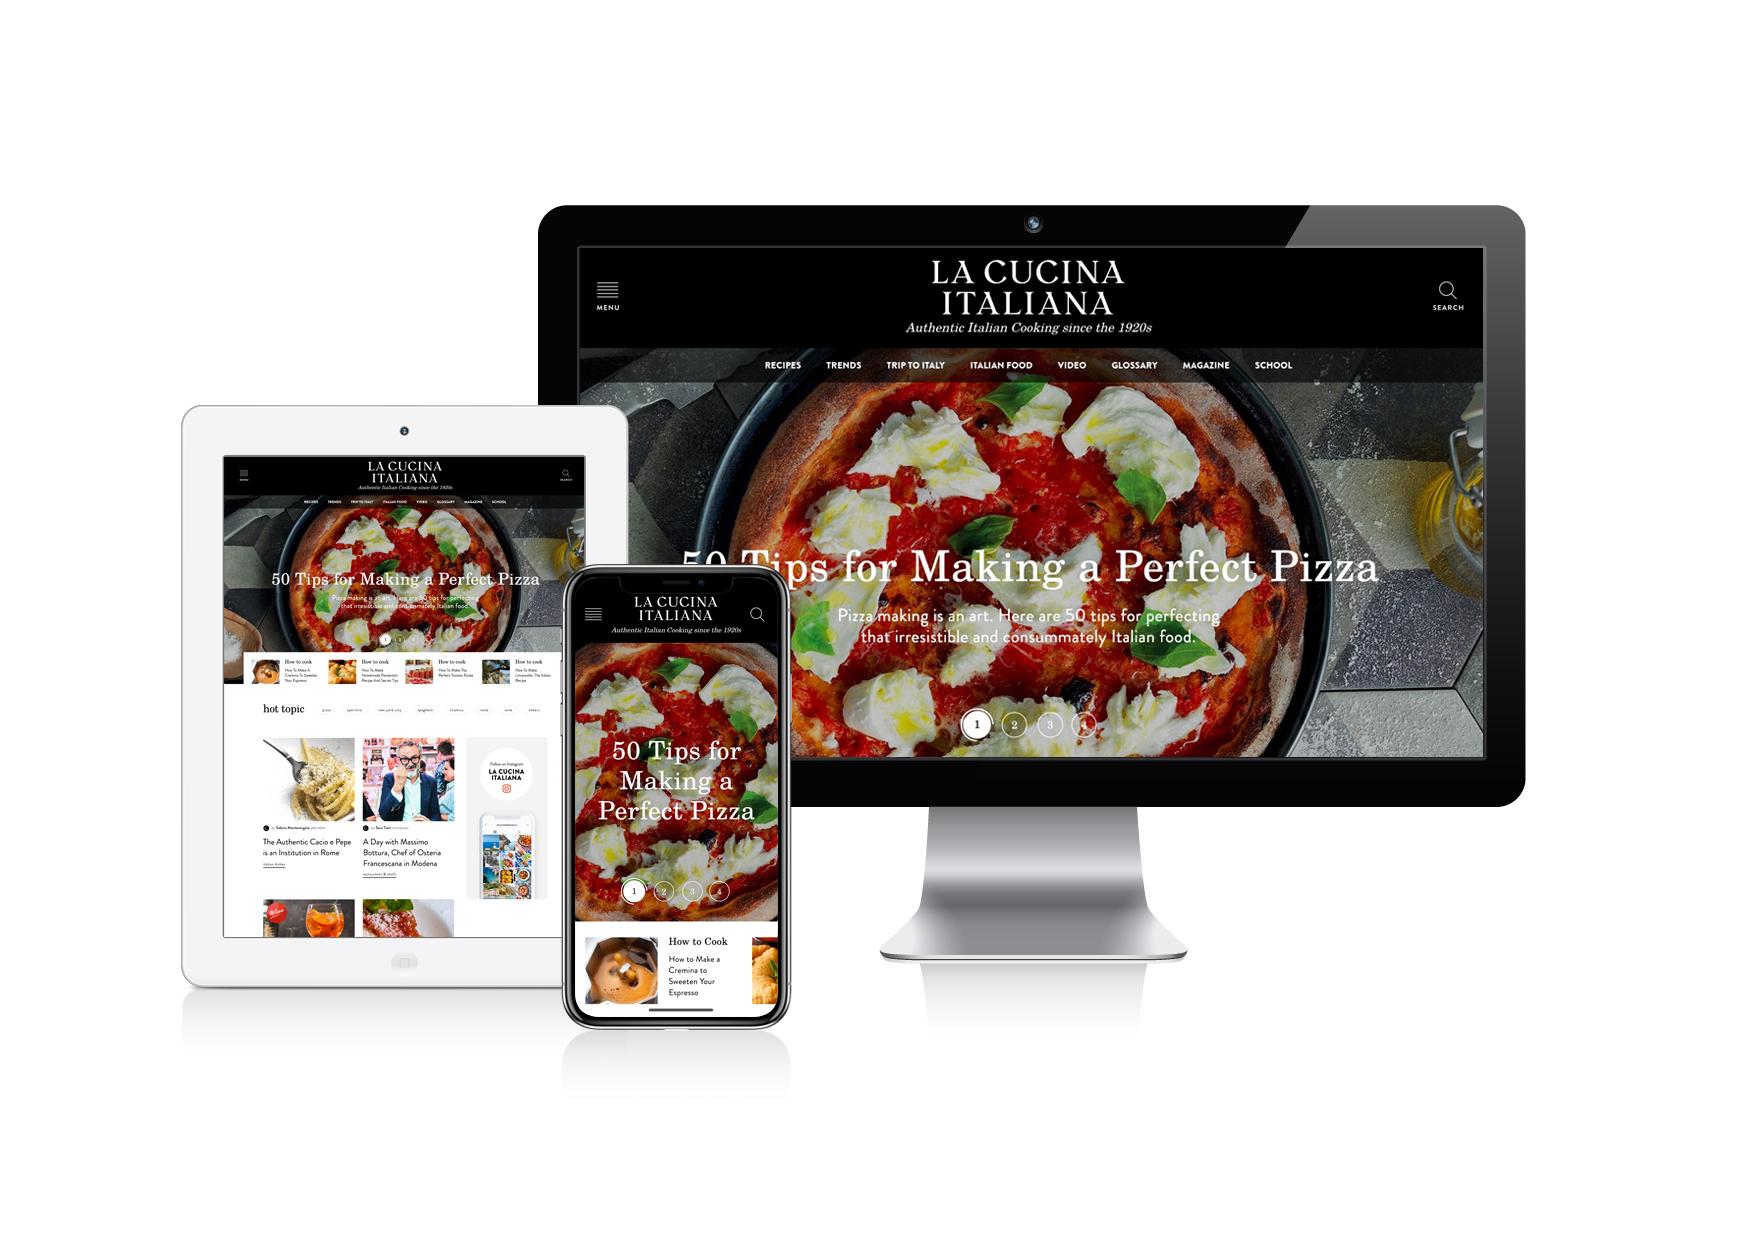 We The Italians | IT and US: La Cucina Italiana comes to the ...